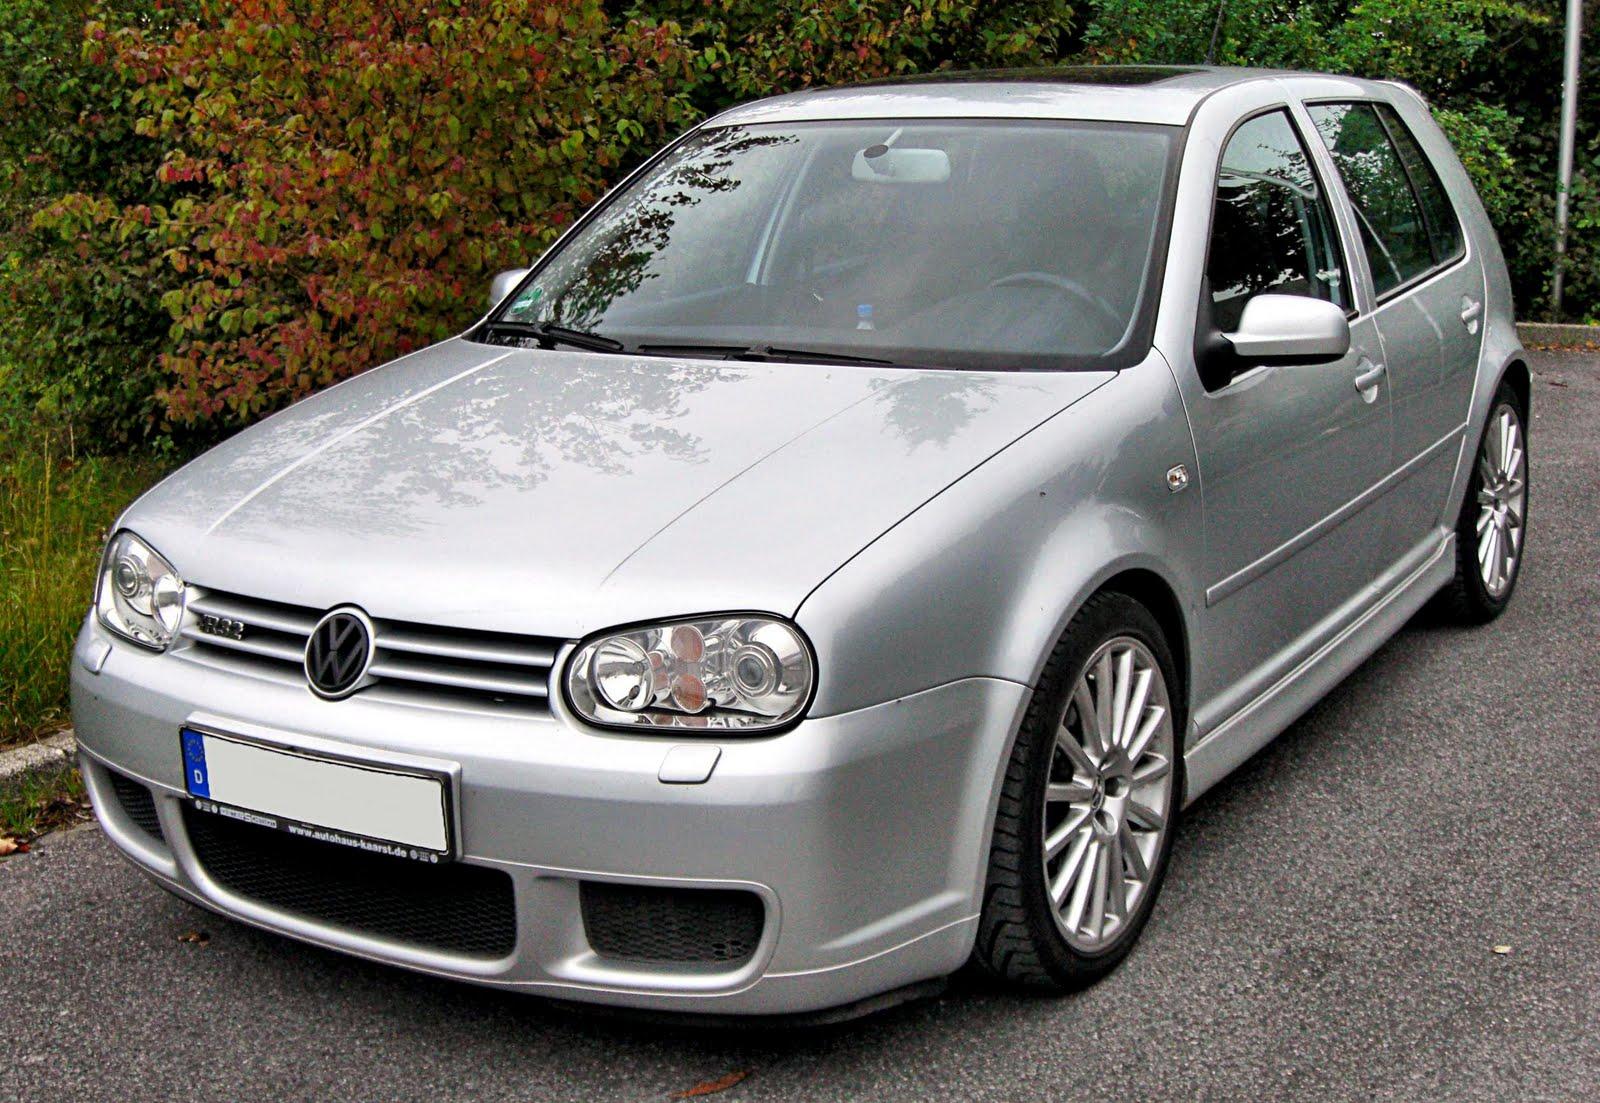 http://3.bp.blogspot.com/_-vTKmEi5teg/TFj4Fc77C6I/AAAAAAAAAD8/UYaNsiofKek/s1600/VW_Golf_IV_R32_20090916_front.jpg